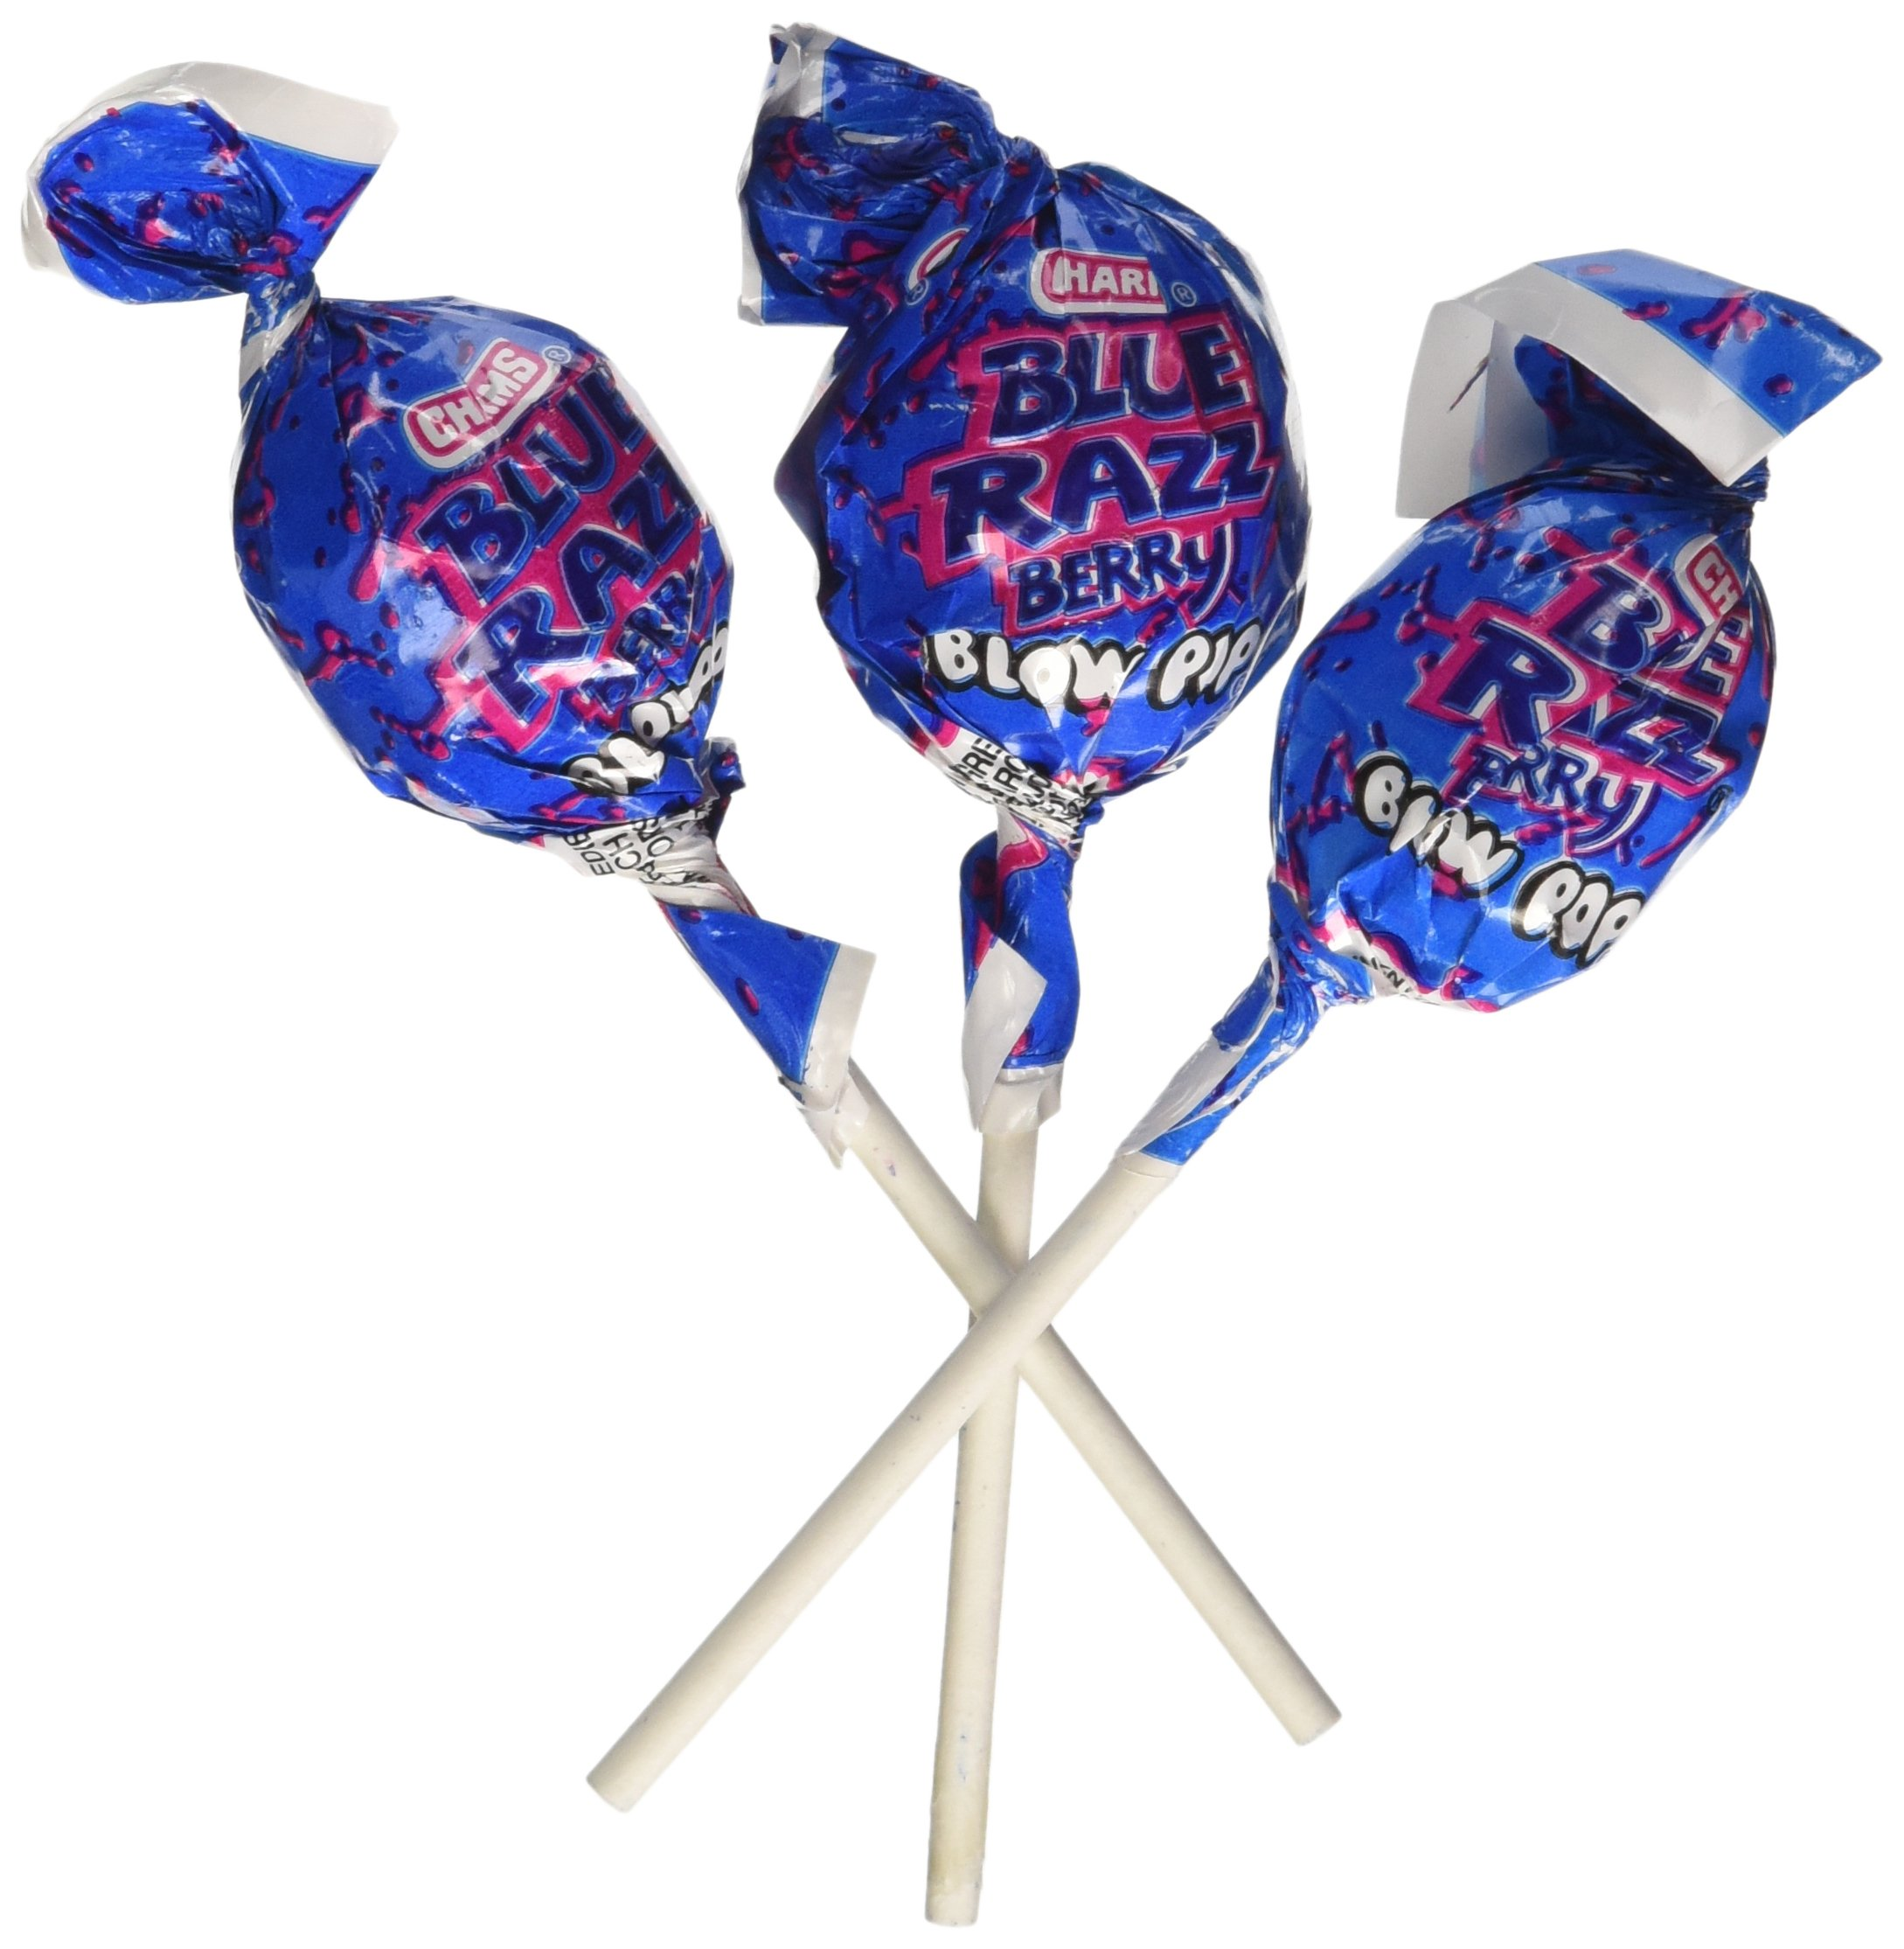 Charms Blue Razzberry Blow Pops Lollipops Quantity: 48 by Charms